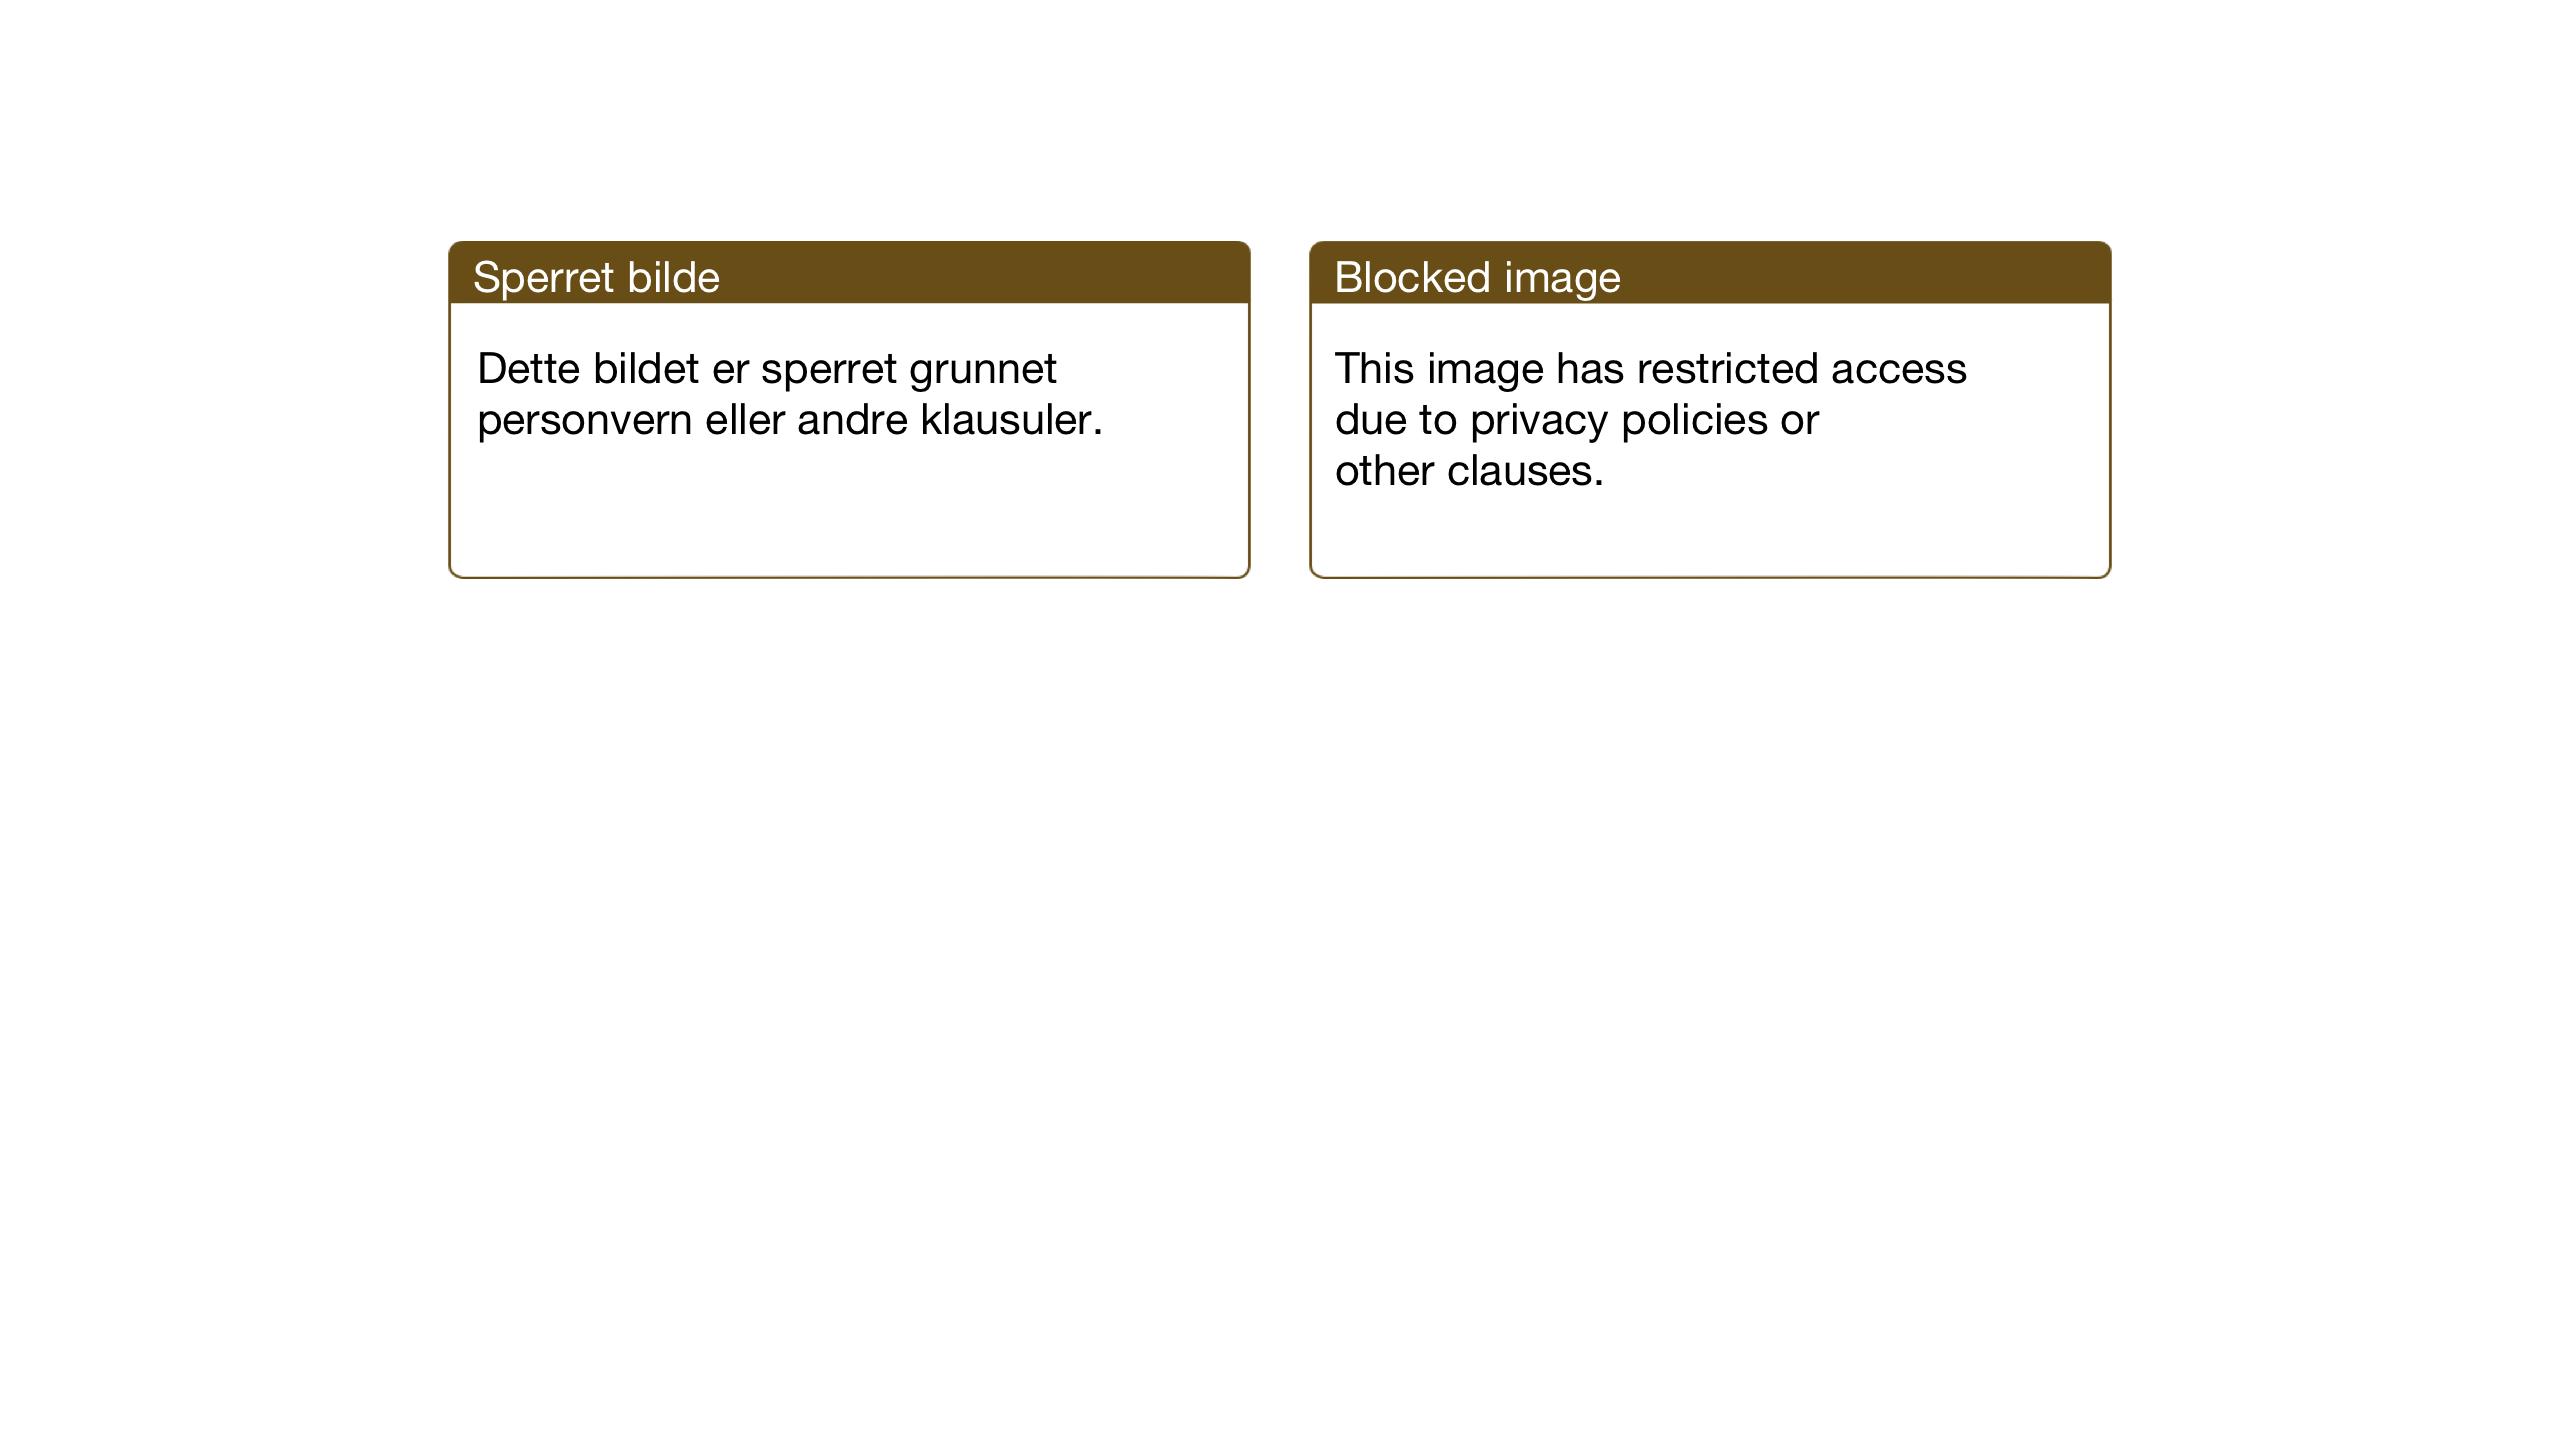 SAH, Vardal prestekontor, H/Ha/Haa/L0018: Ministerialbok nr. 18, 1930-1945, s. 167